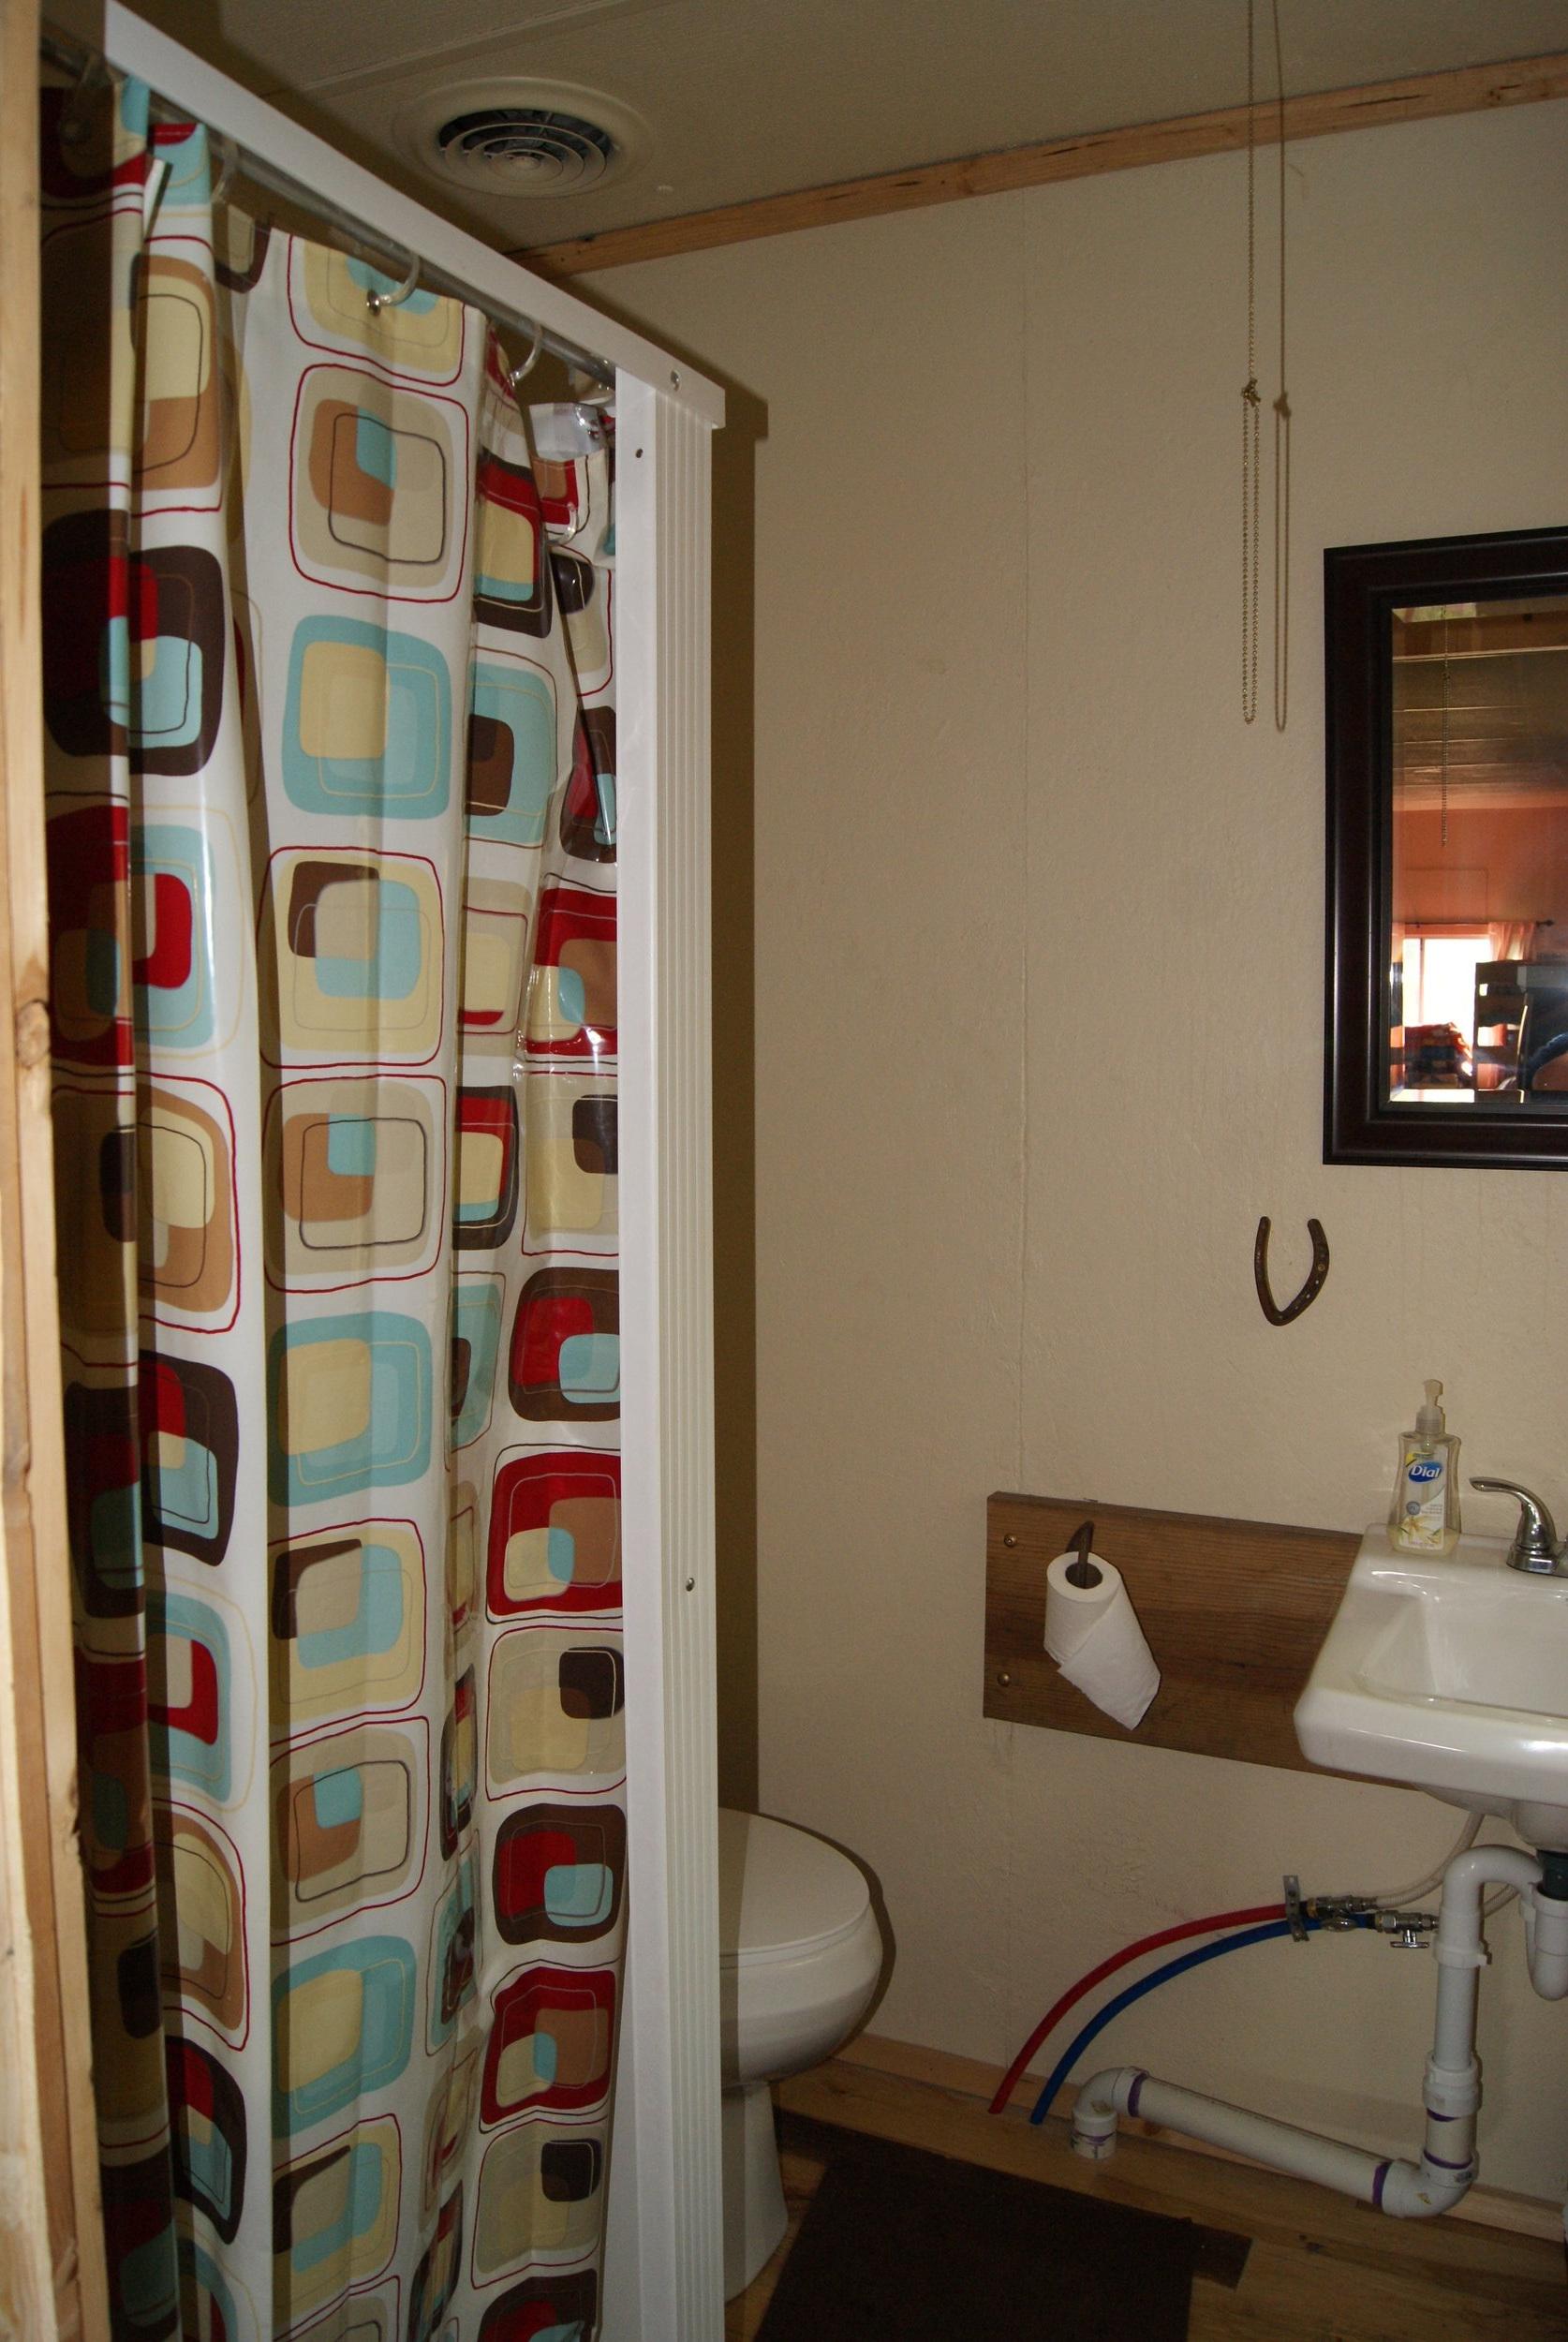 The Bunkhouse: Kansa bathroom with shower